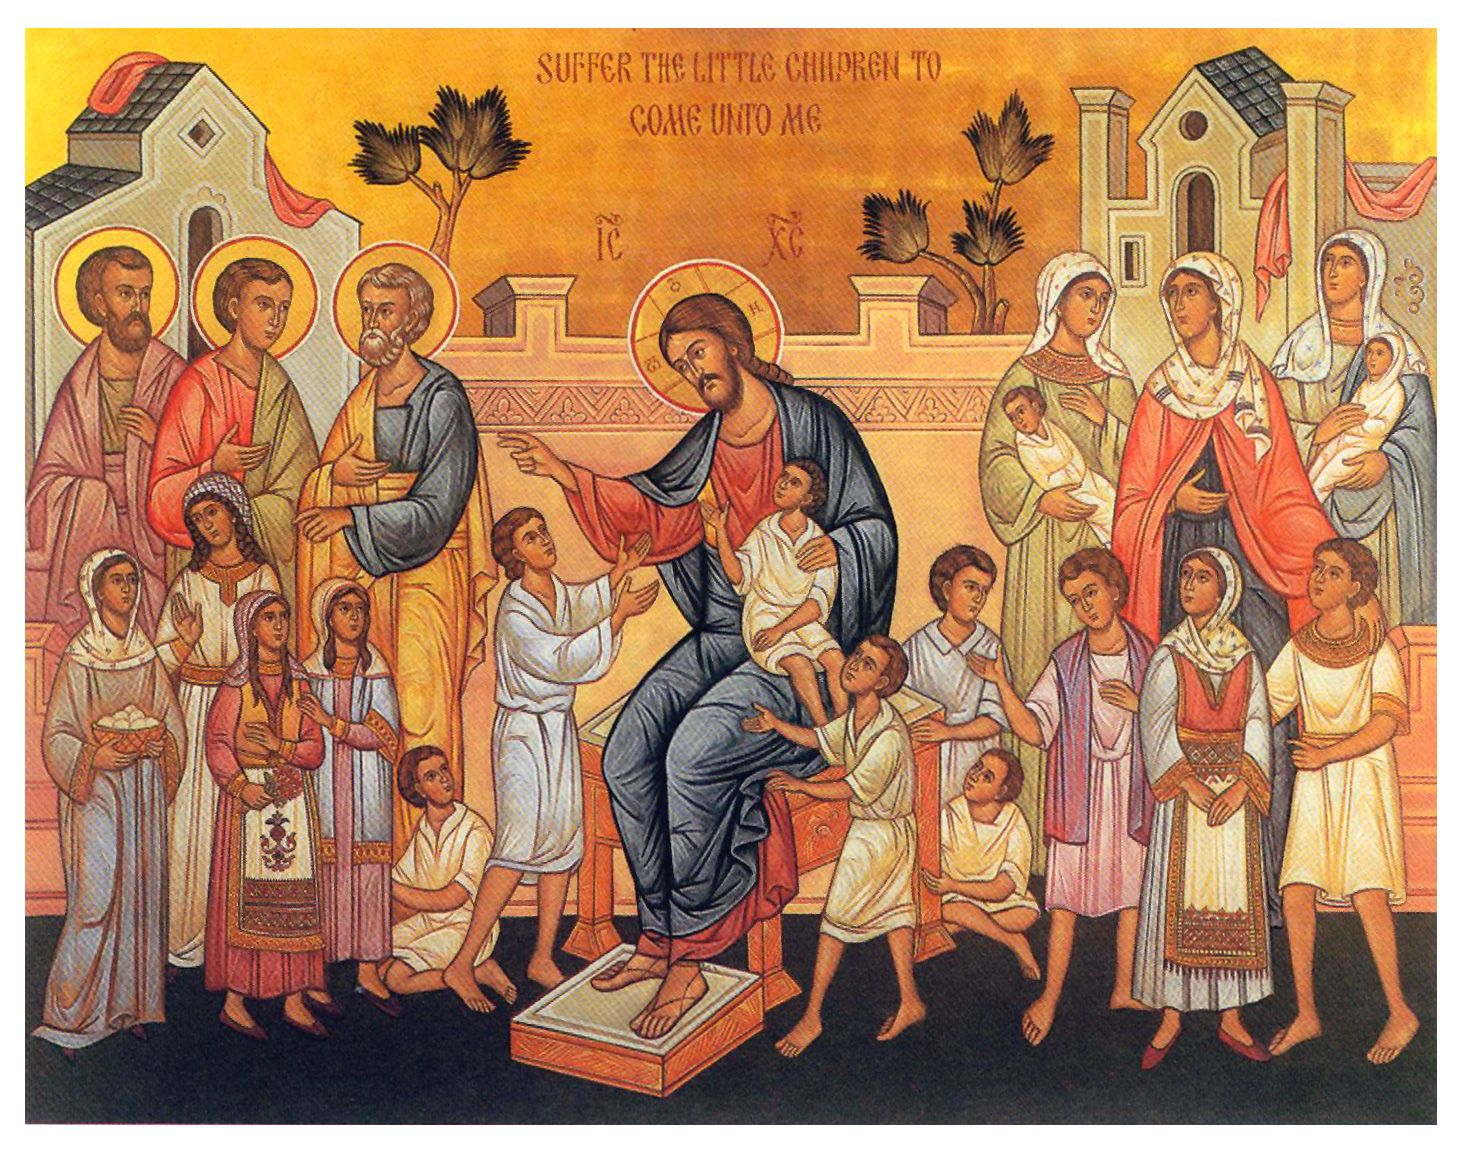 Iisus-Lasati-copiii-sa-vina-la-Mine